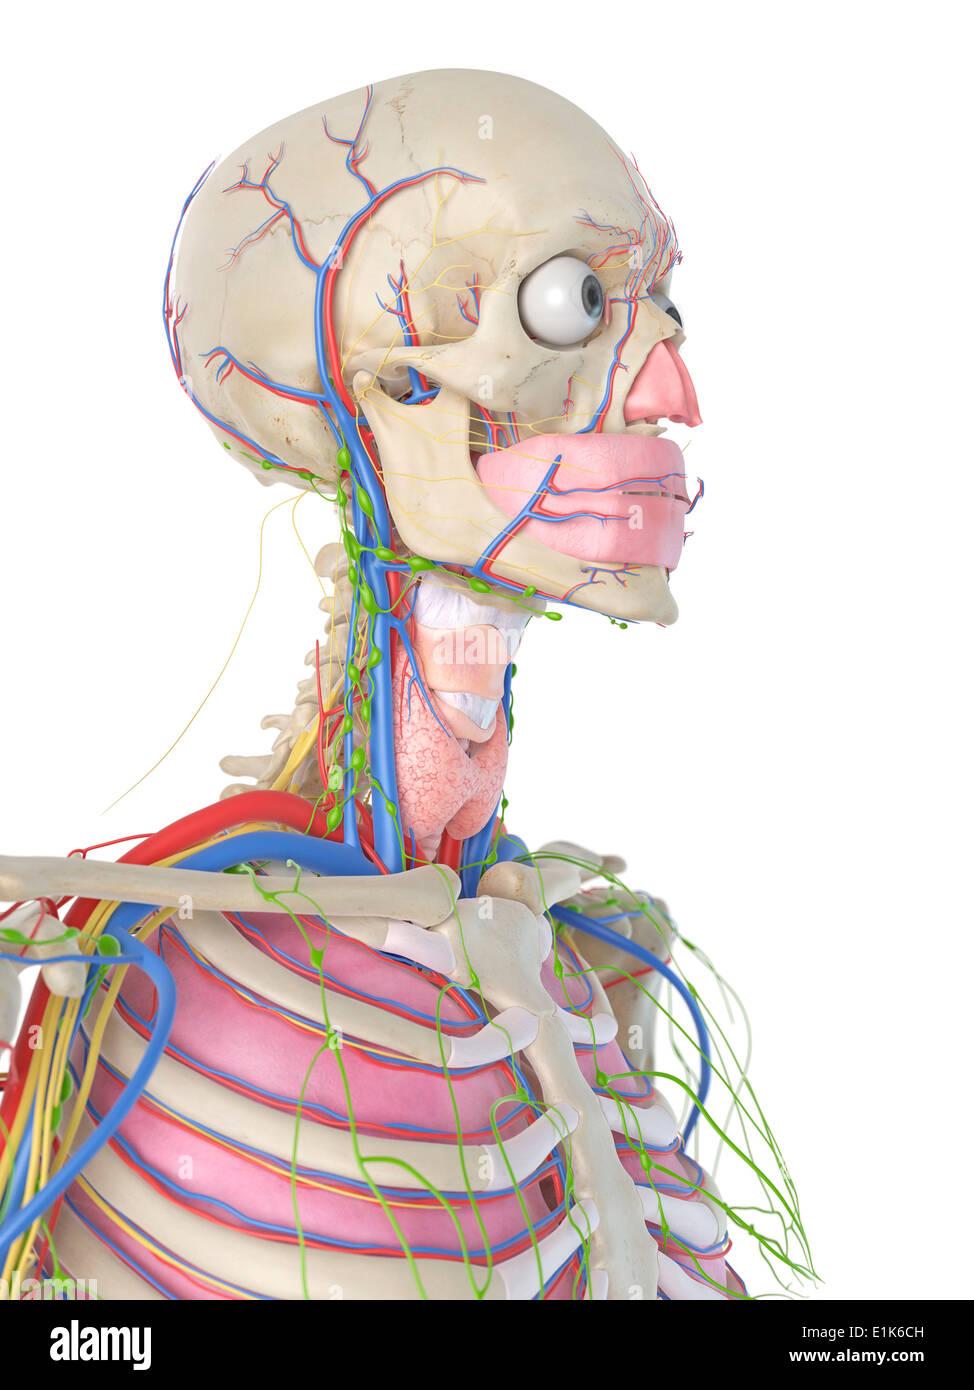 Head Blood Vessels Stockfotos & Head Blood Vessels Bilder - Alamy